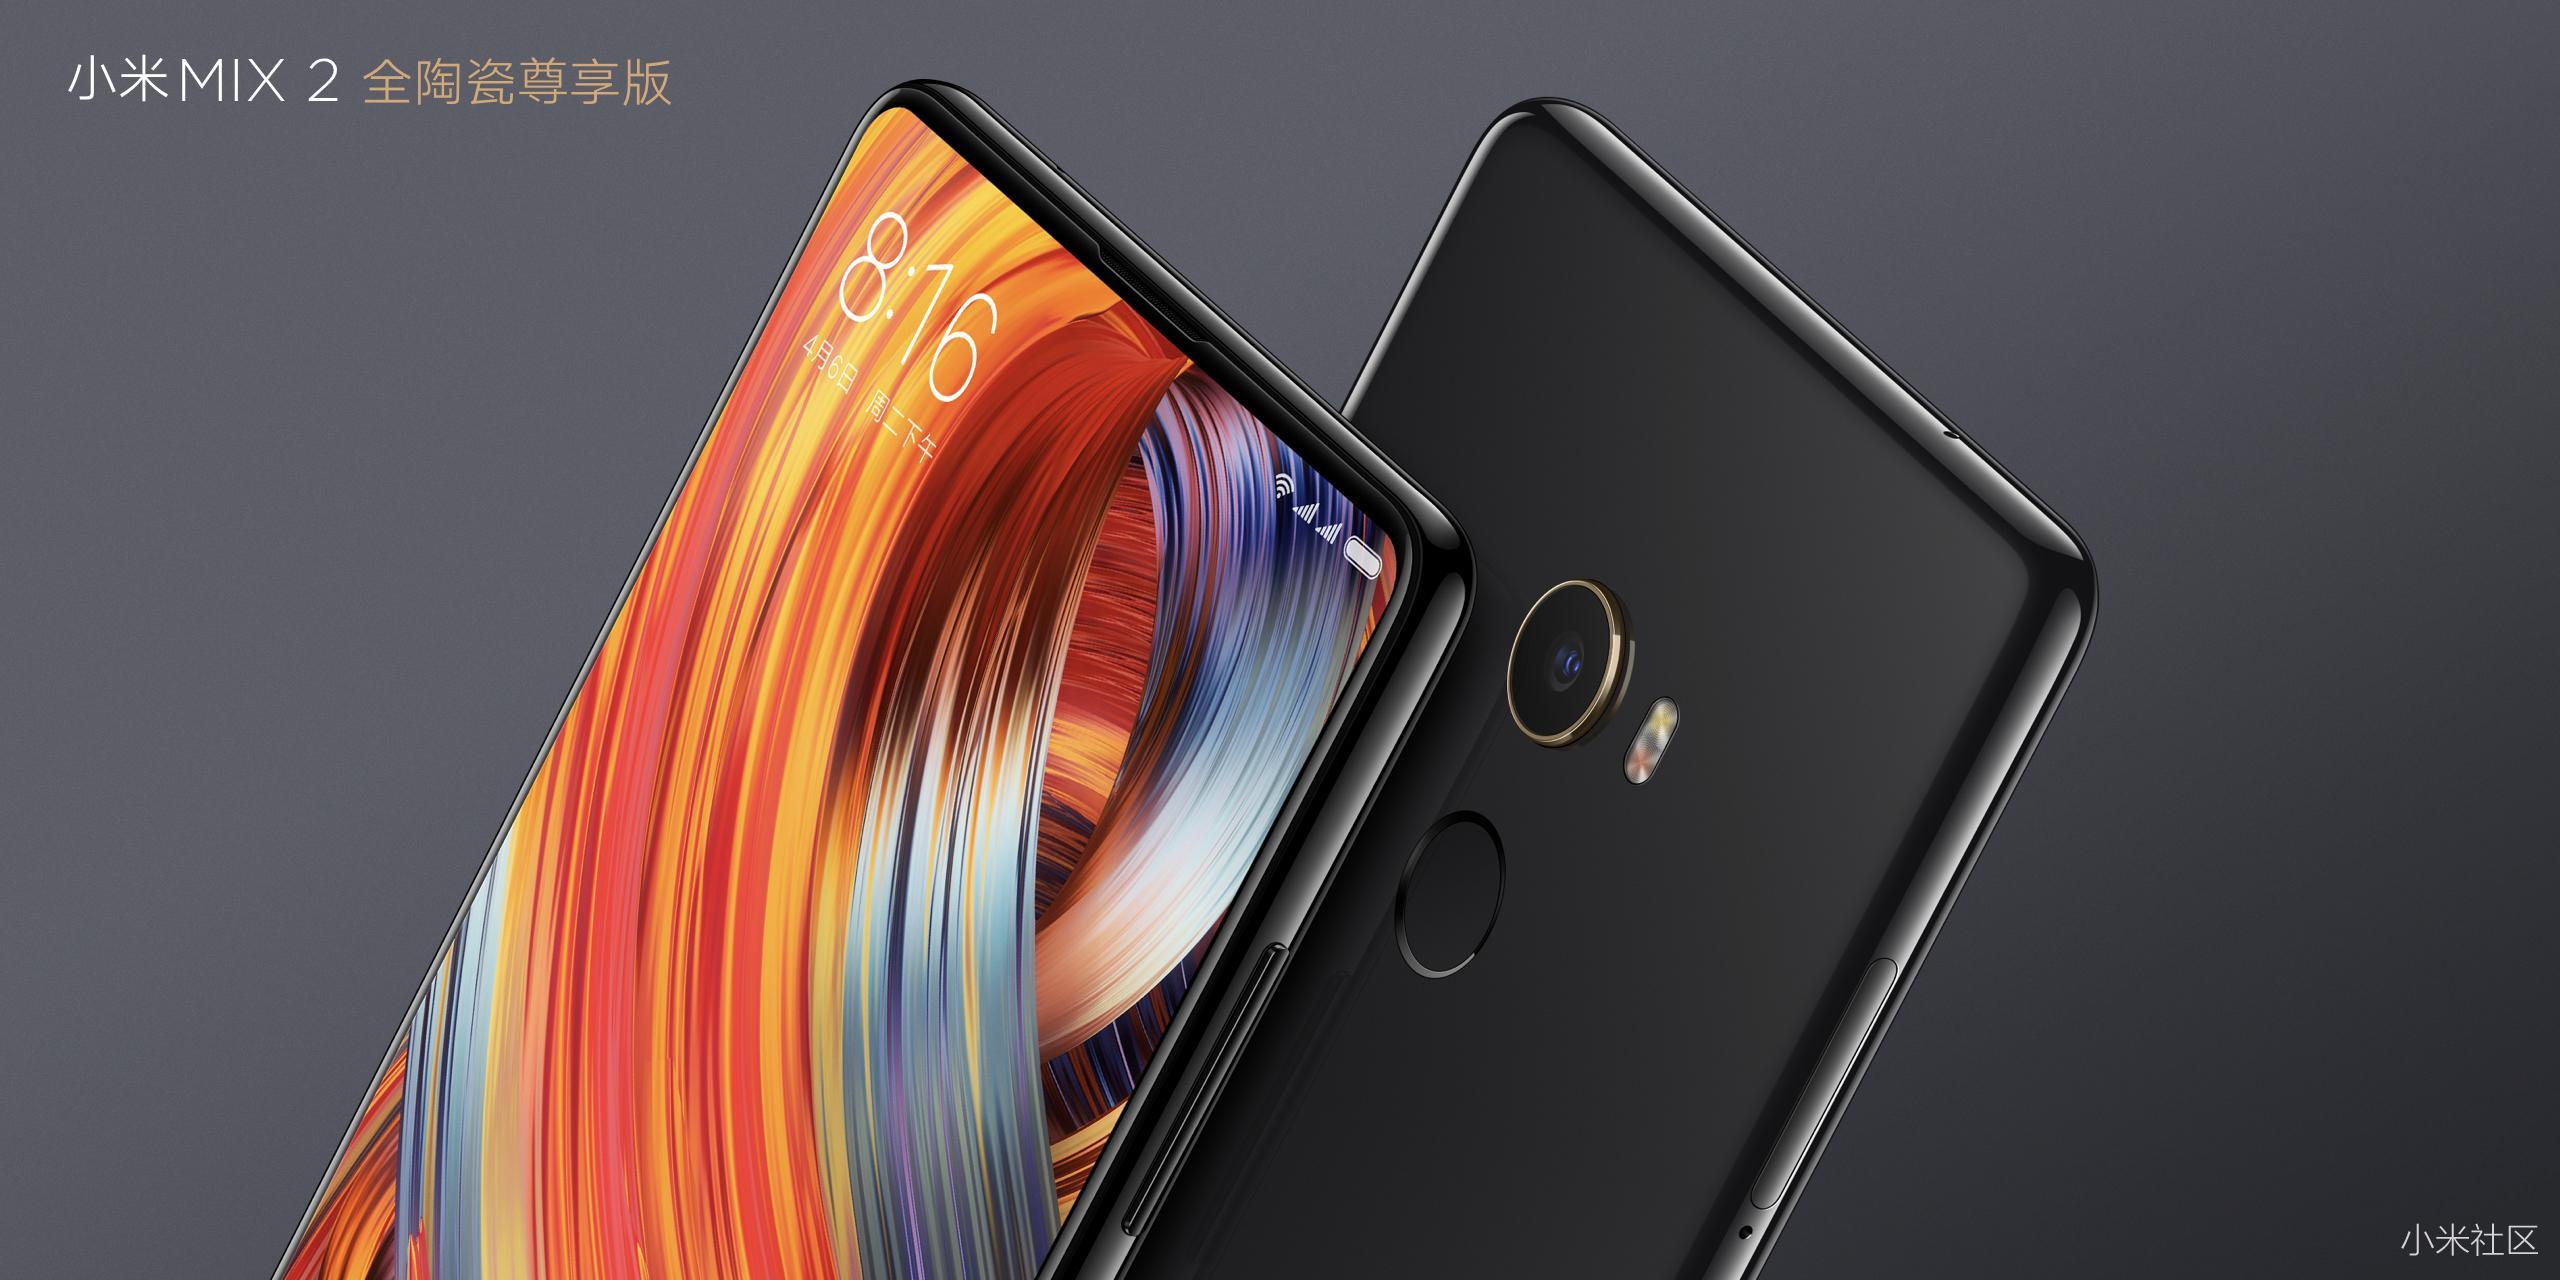 Xiaomi Mi MIX 2 pantalla 2